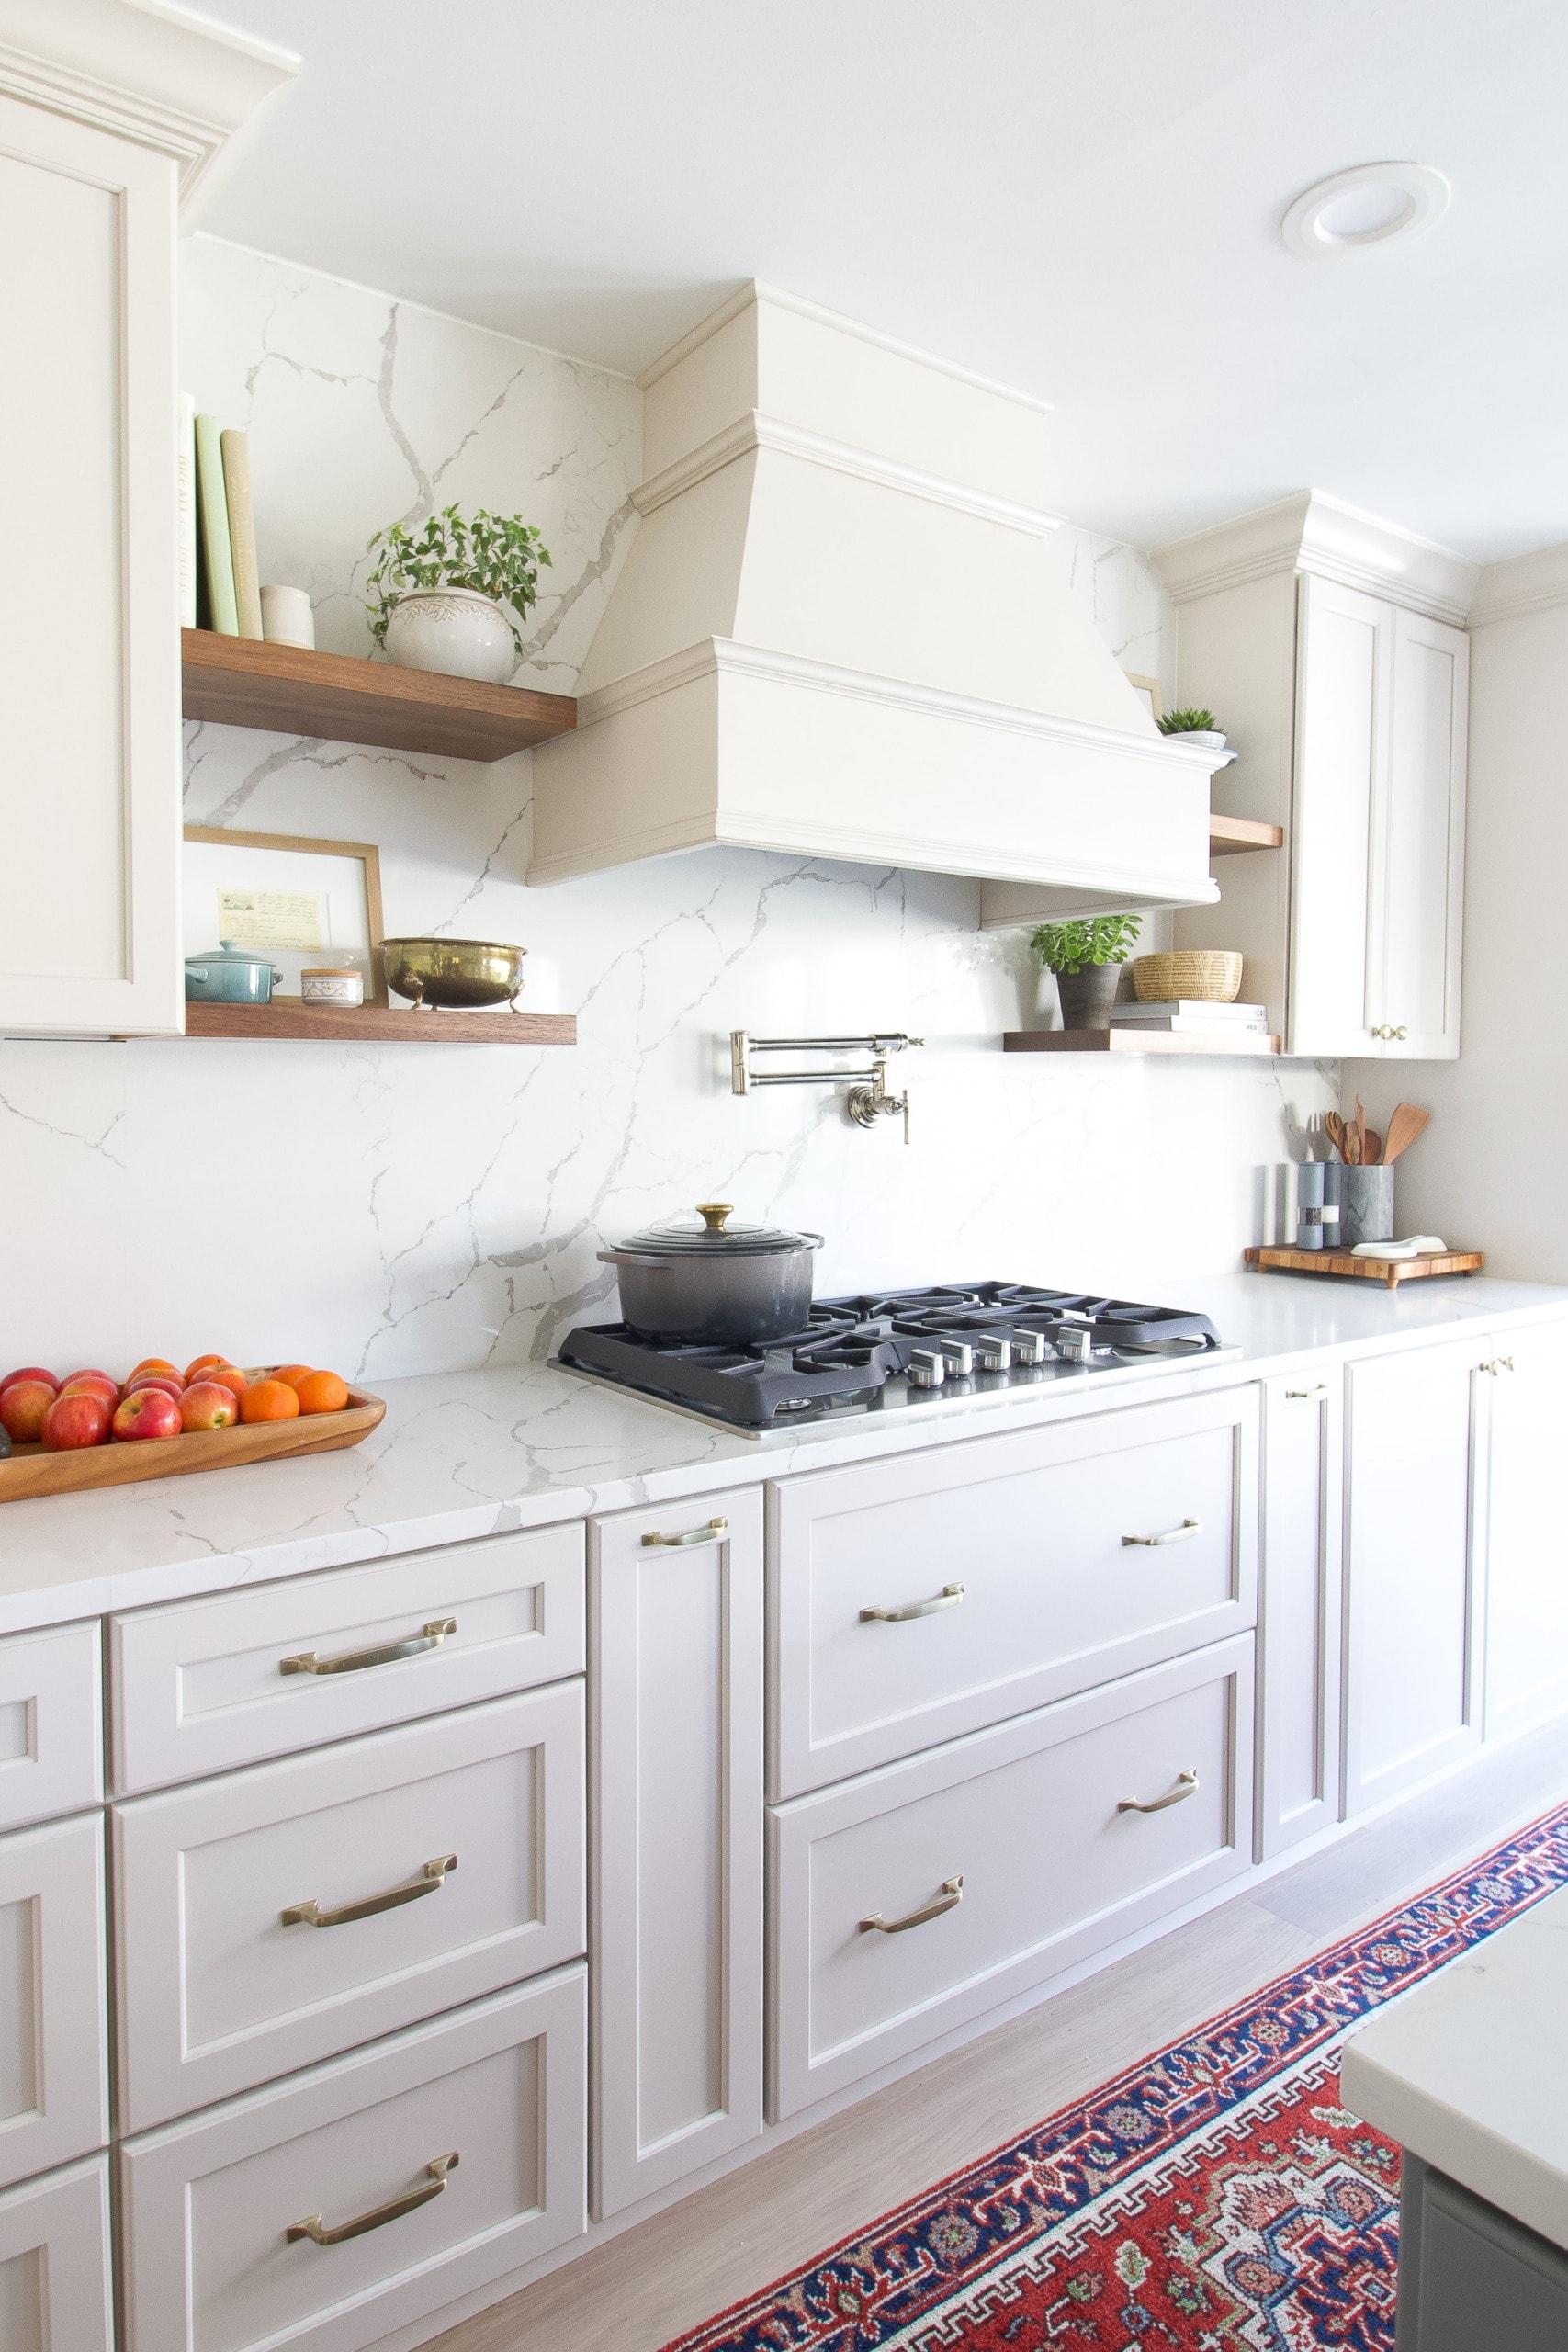 Adding open shelving near a hood in a kitchen